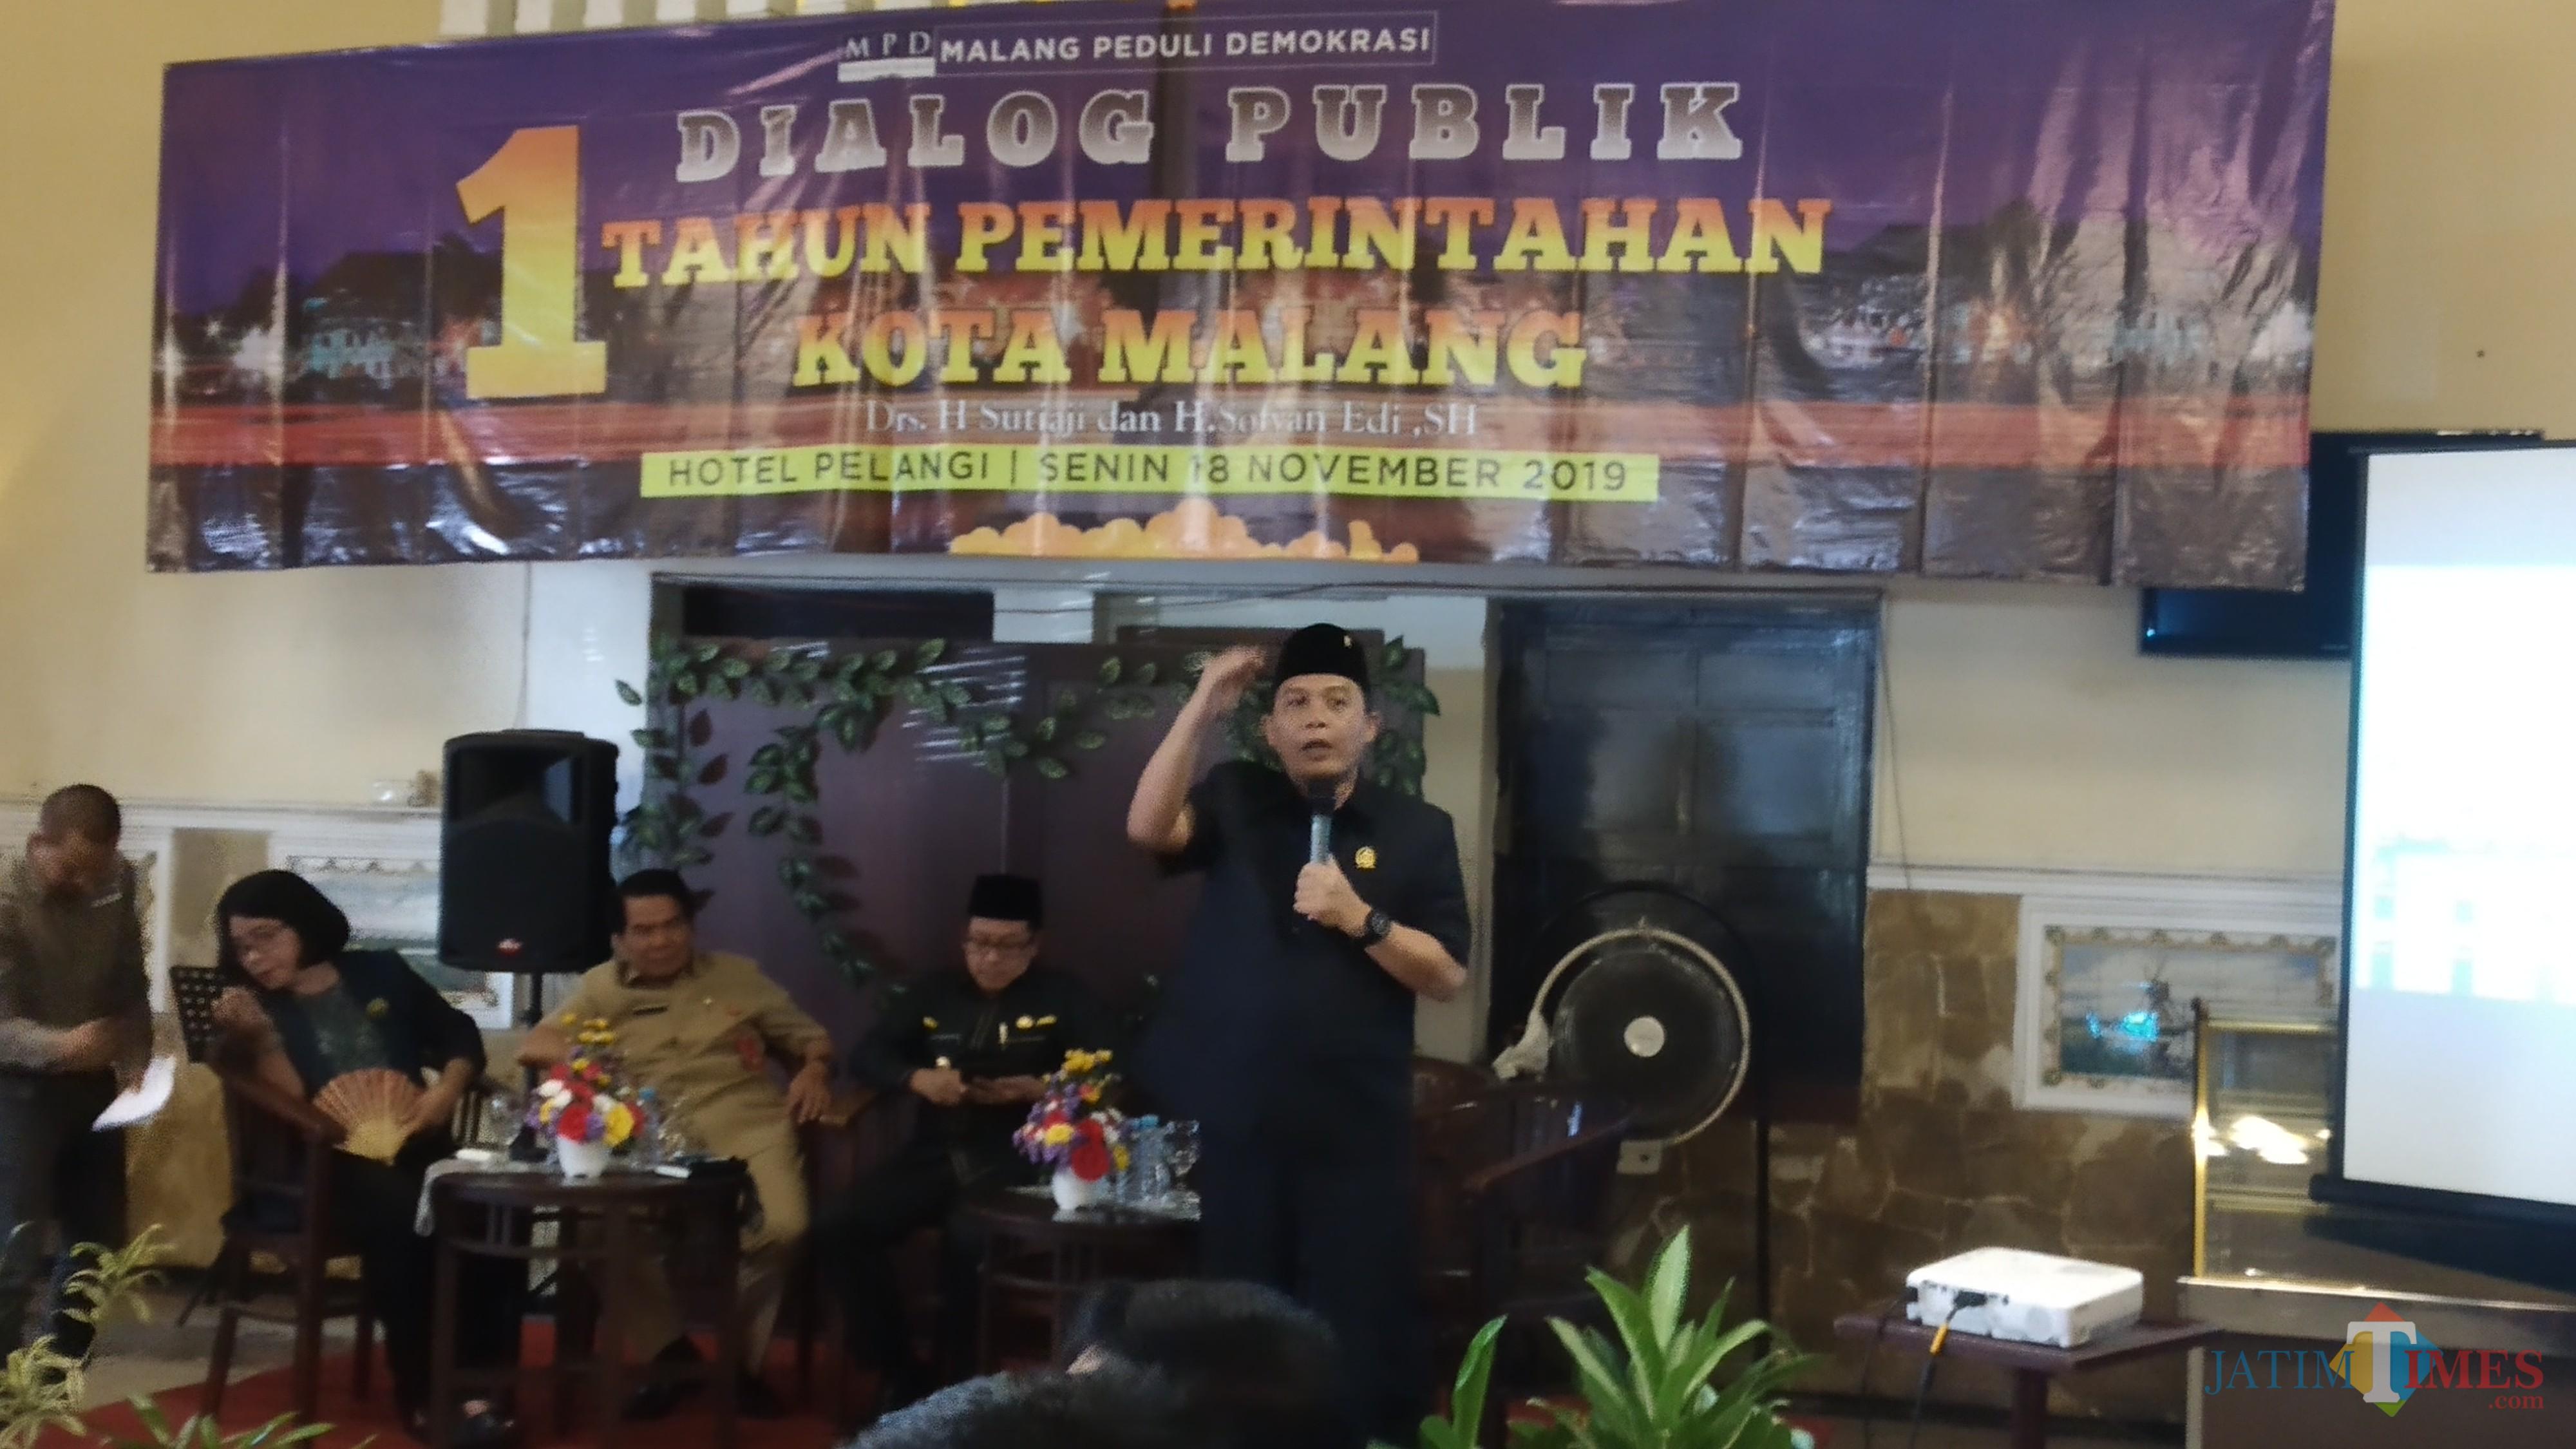 Ketua DPRD Kota Malang I Made Riandiana Kartika (berdiri) saat menghadiri dialog publik satu tahun pemerintahan Kota Malang (Pipit Anggraeni/MalangTIMES).